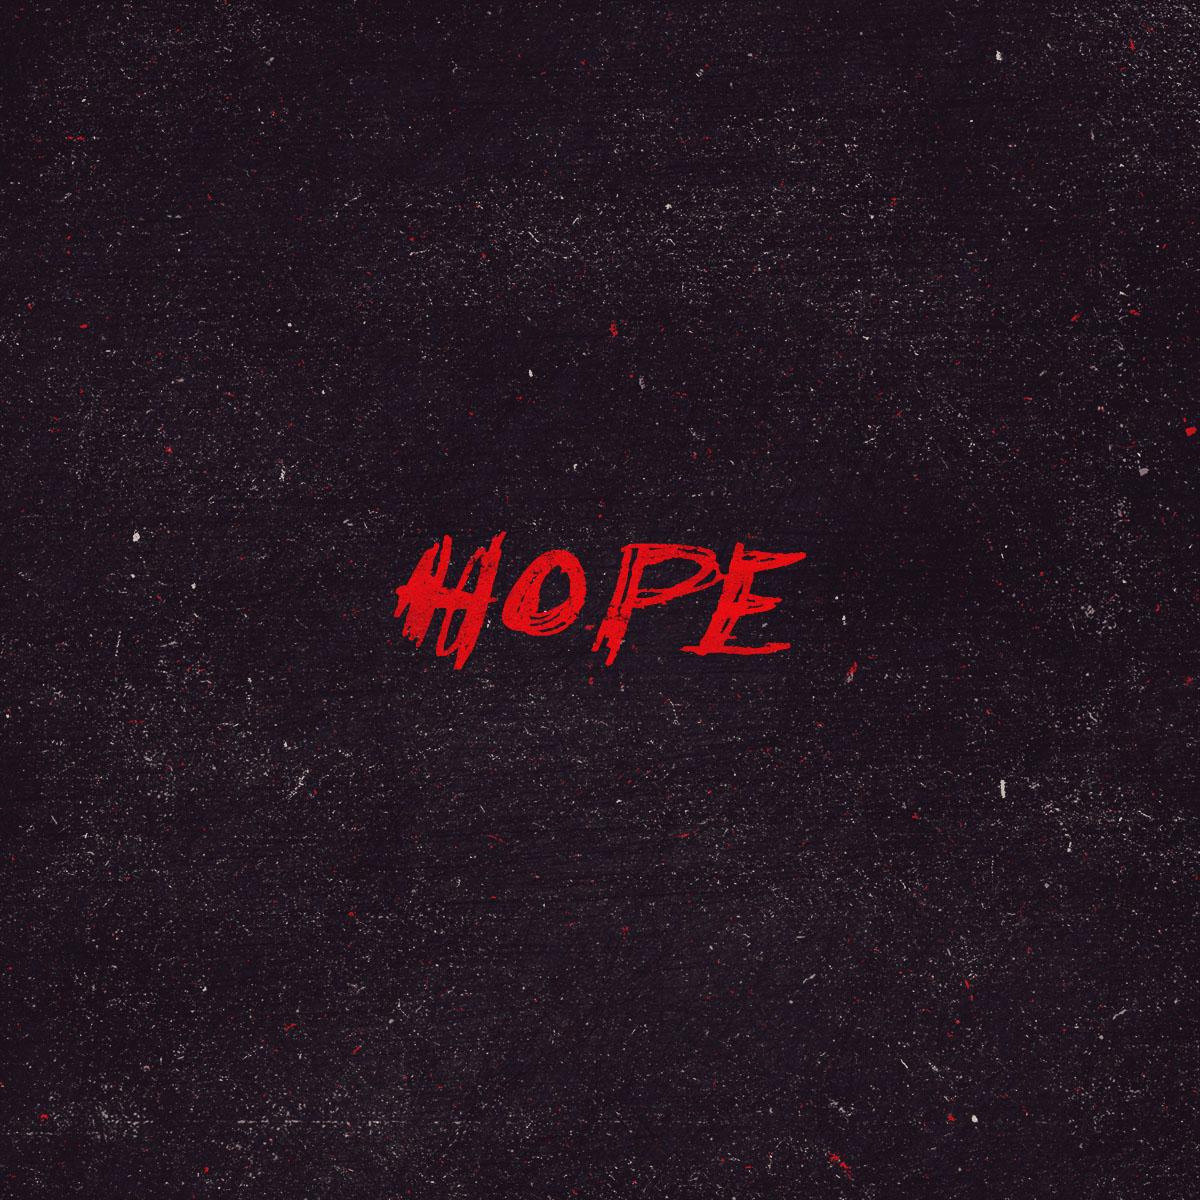 Hope-4_1x1_square.jpg